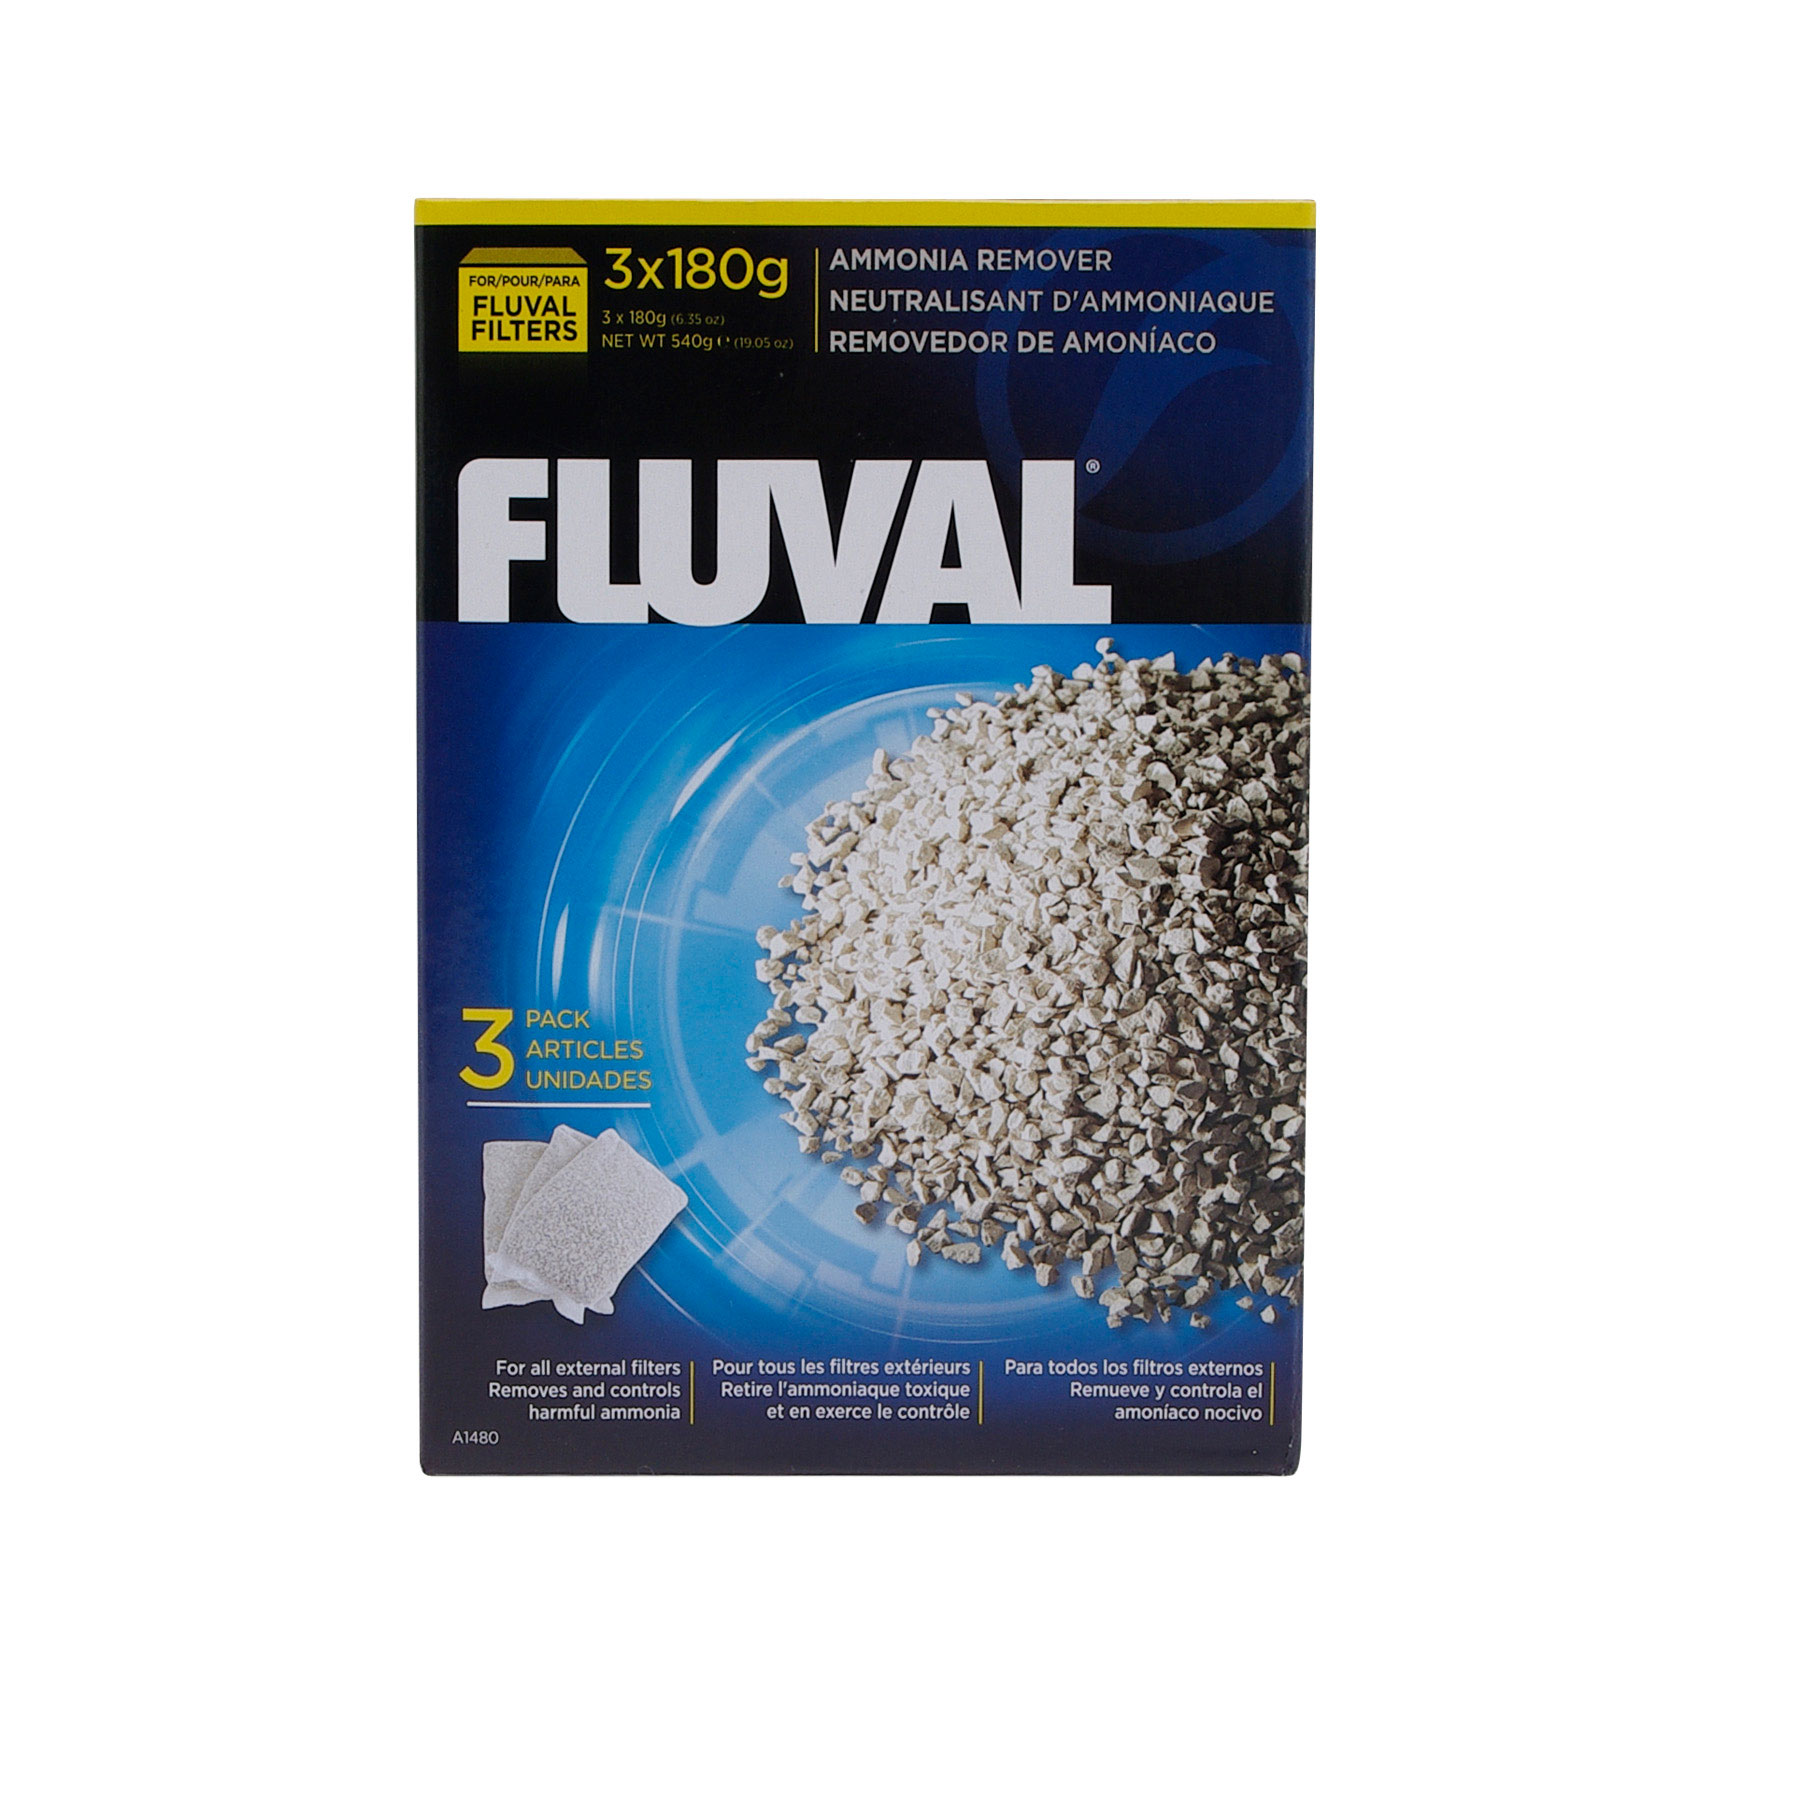 Fluval Ammonia Remover 3 x 180g Nylon Bags